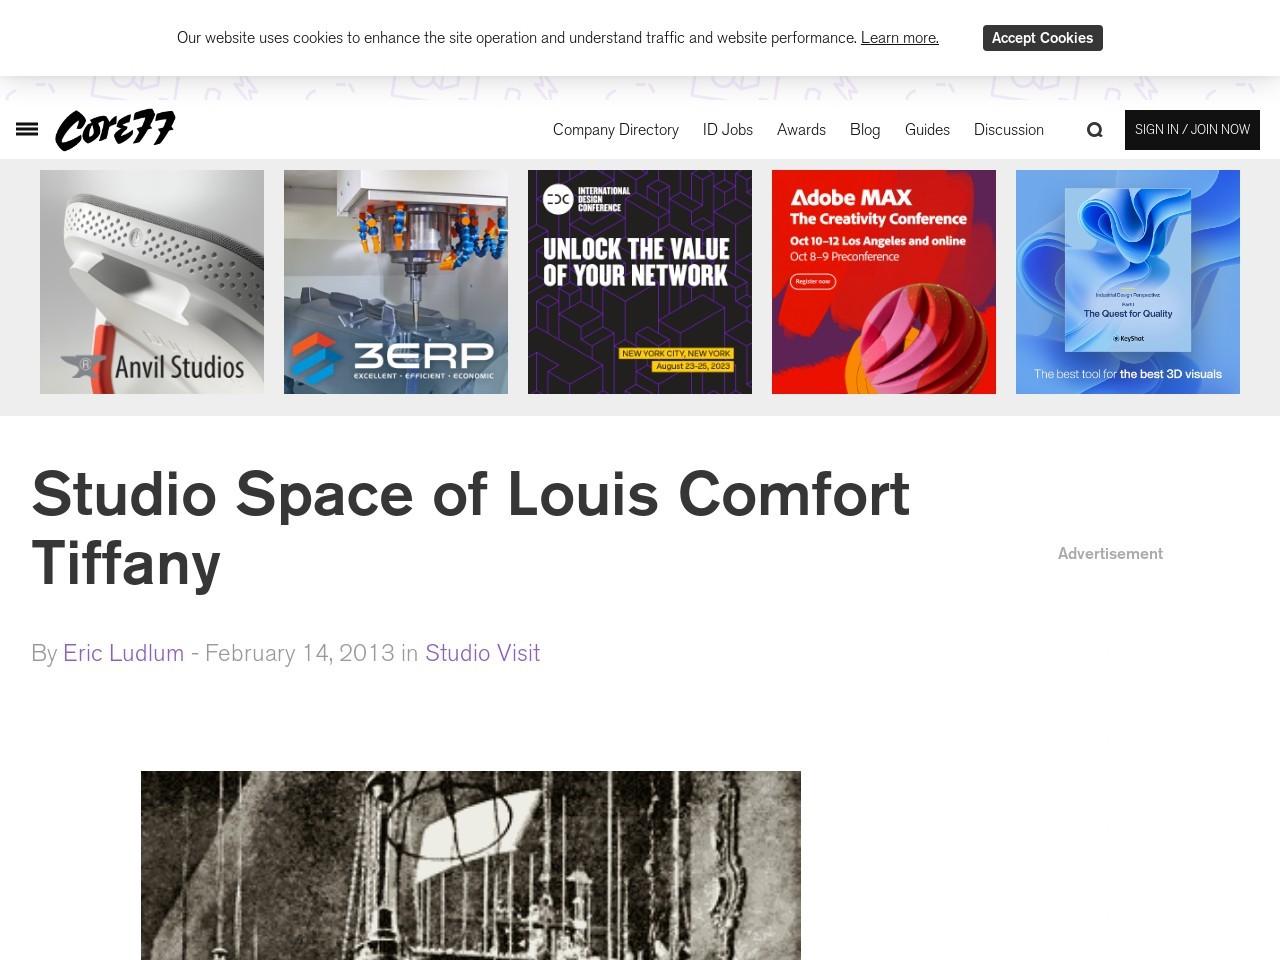 Studio Space of Louis Comfort Tiffany – Core77